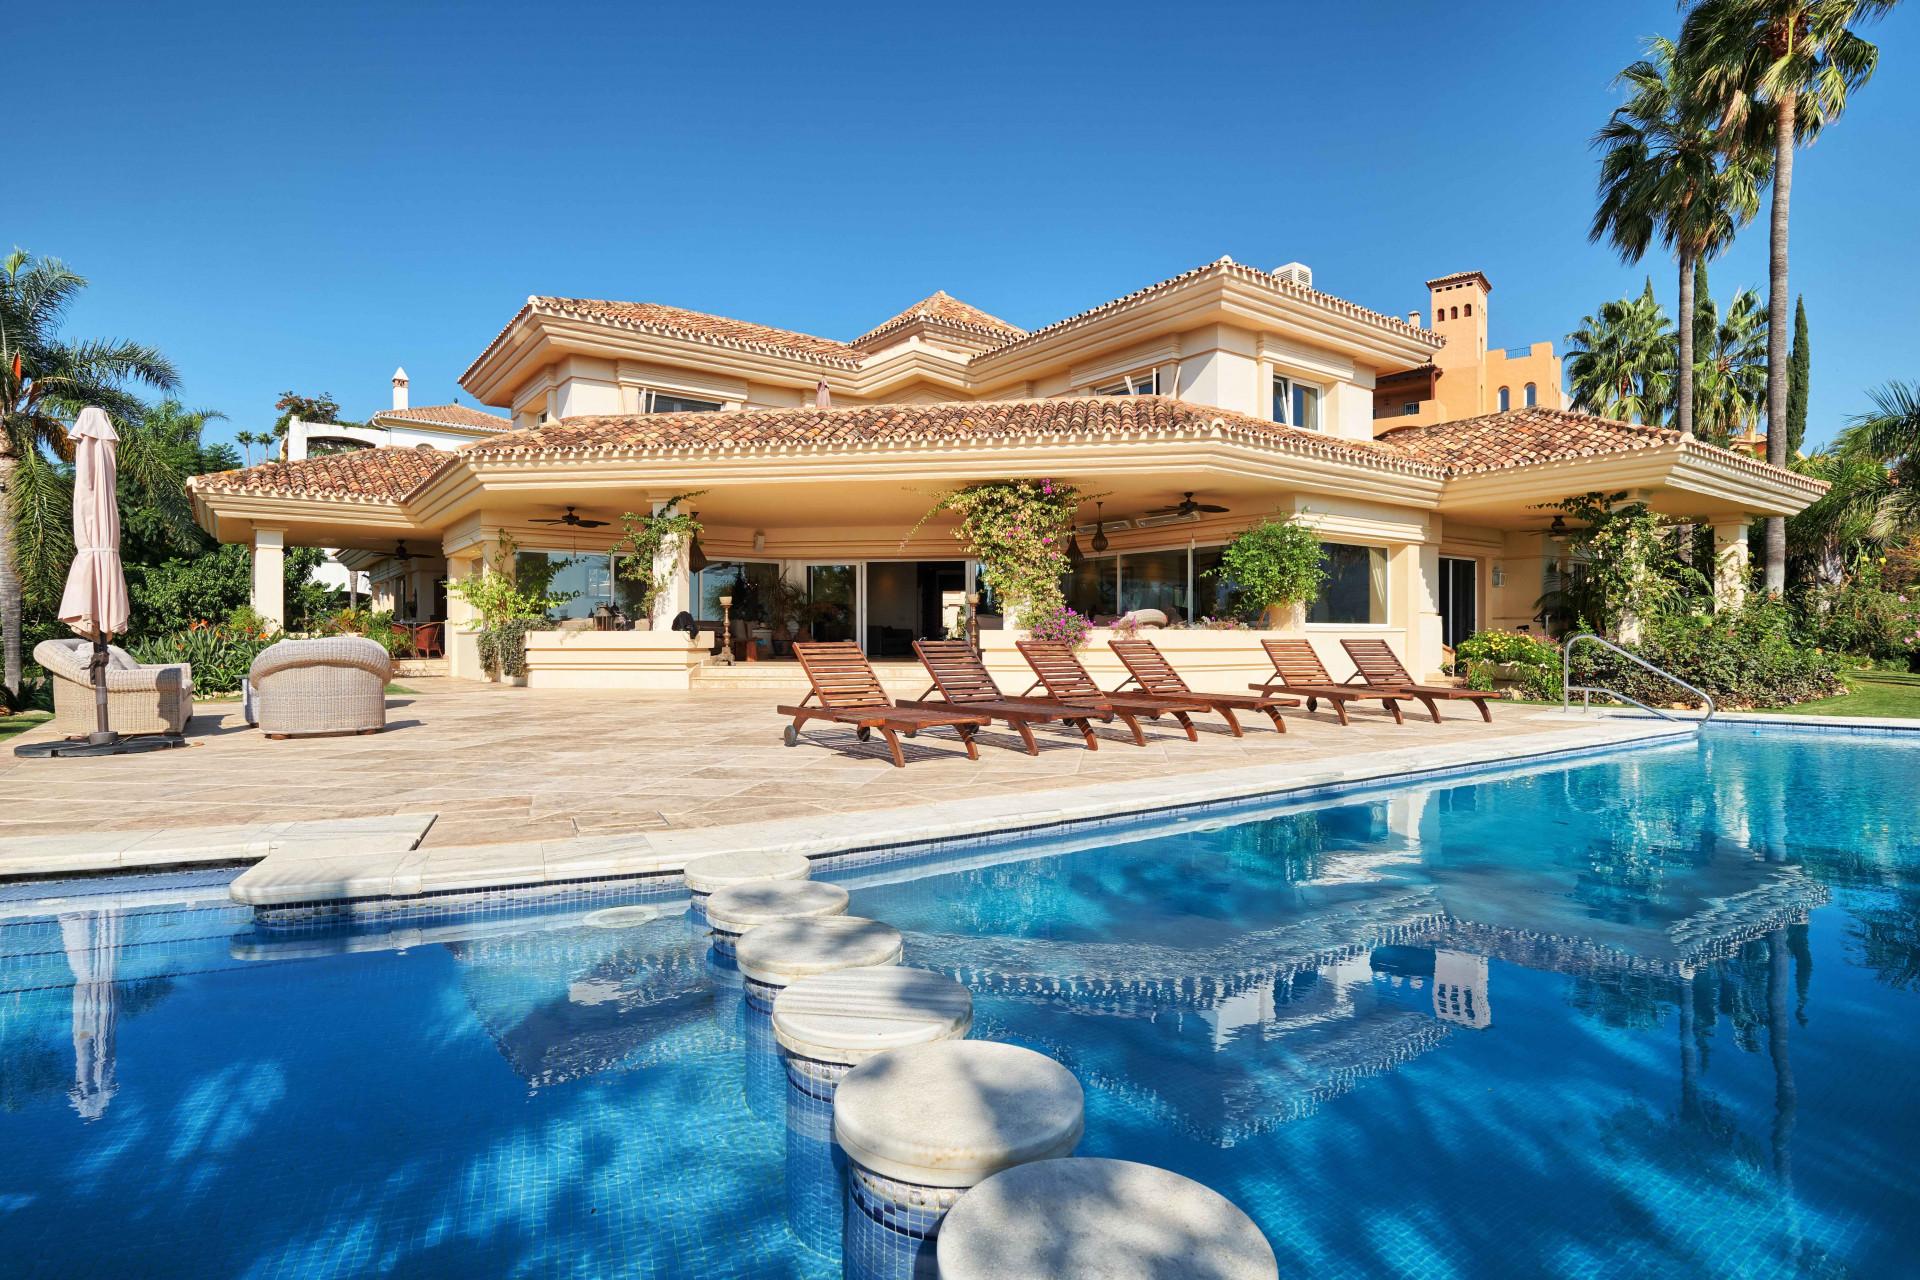 Luxury villa for sale in La Cerquilla Nueva Andalucia